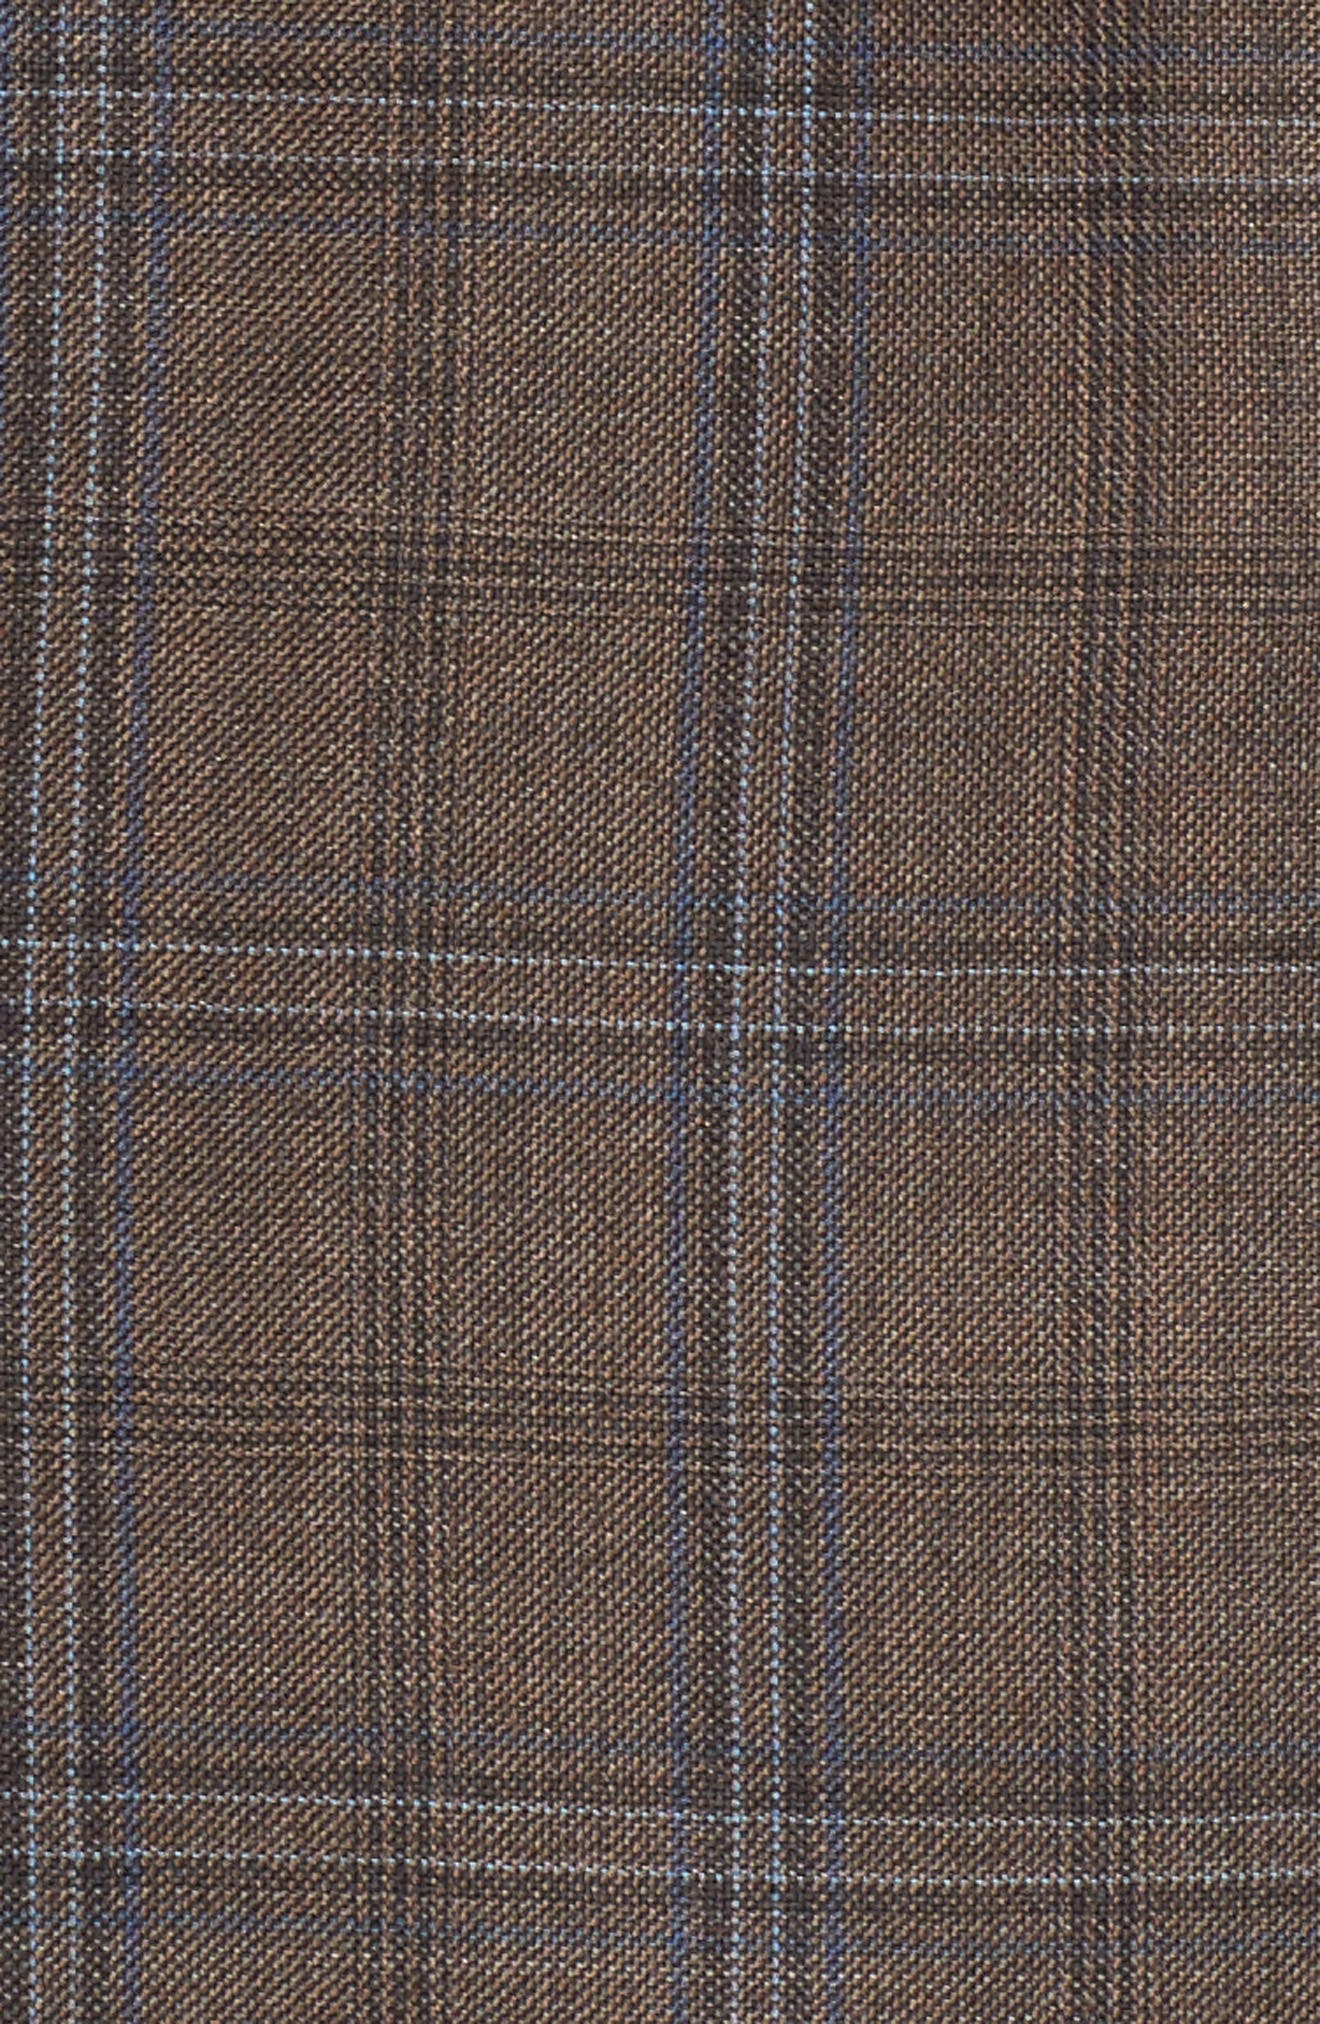 Alternate Image 5  - Hart Schaffner Marx Classic Fit Plaid Wool Sport Coat